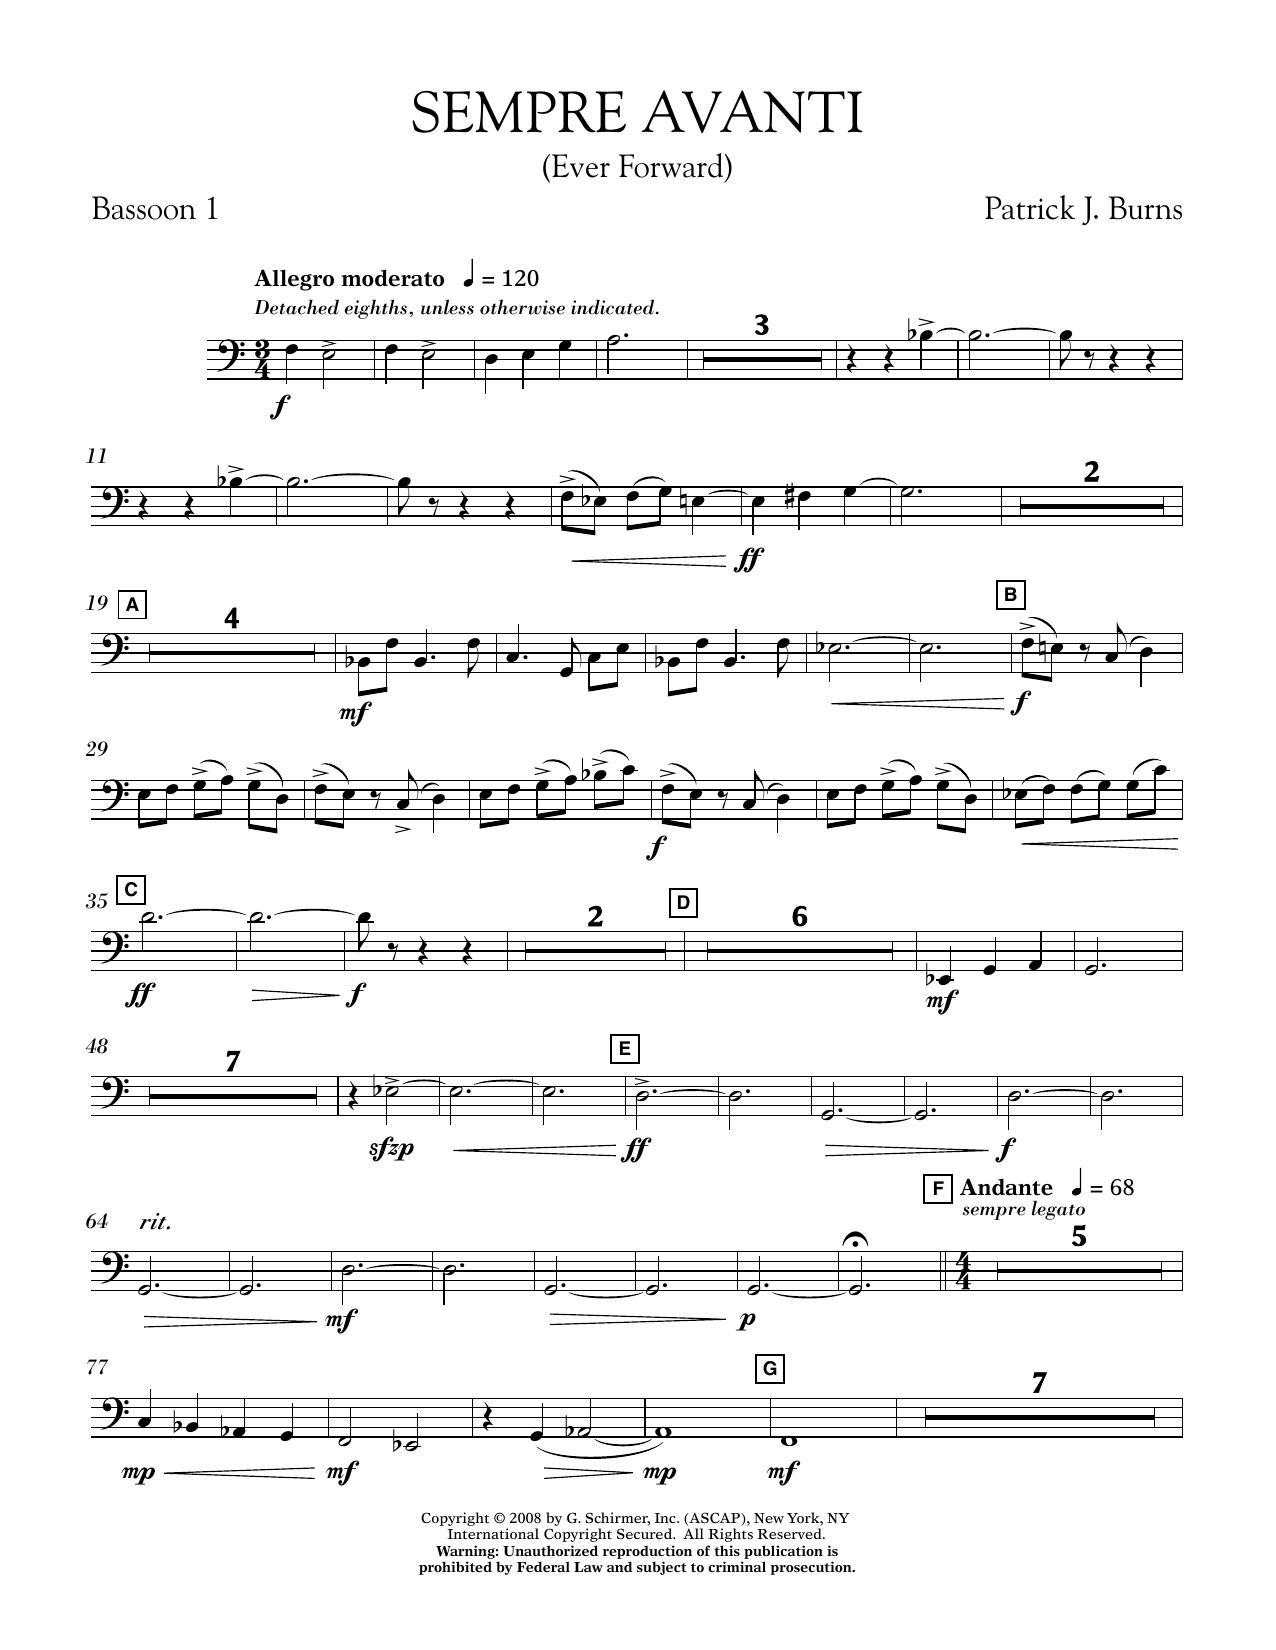 Sempre Avanti - Bassoon 1